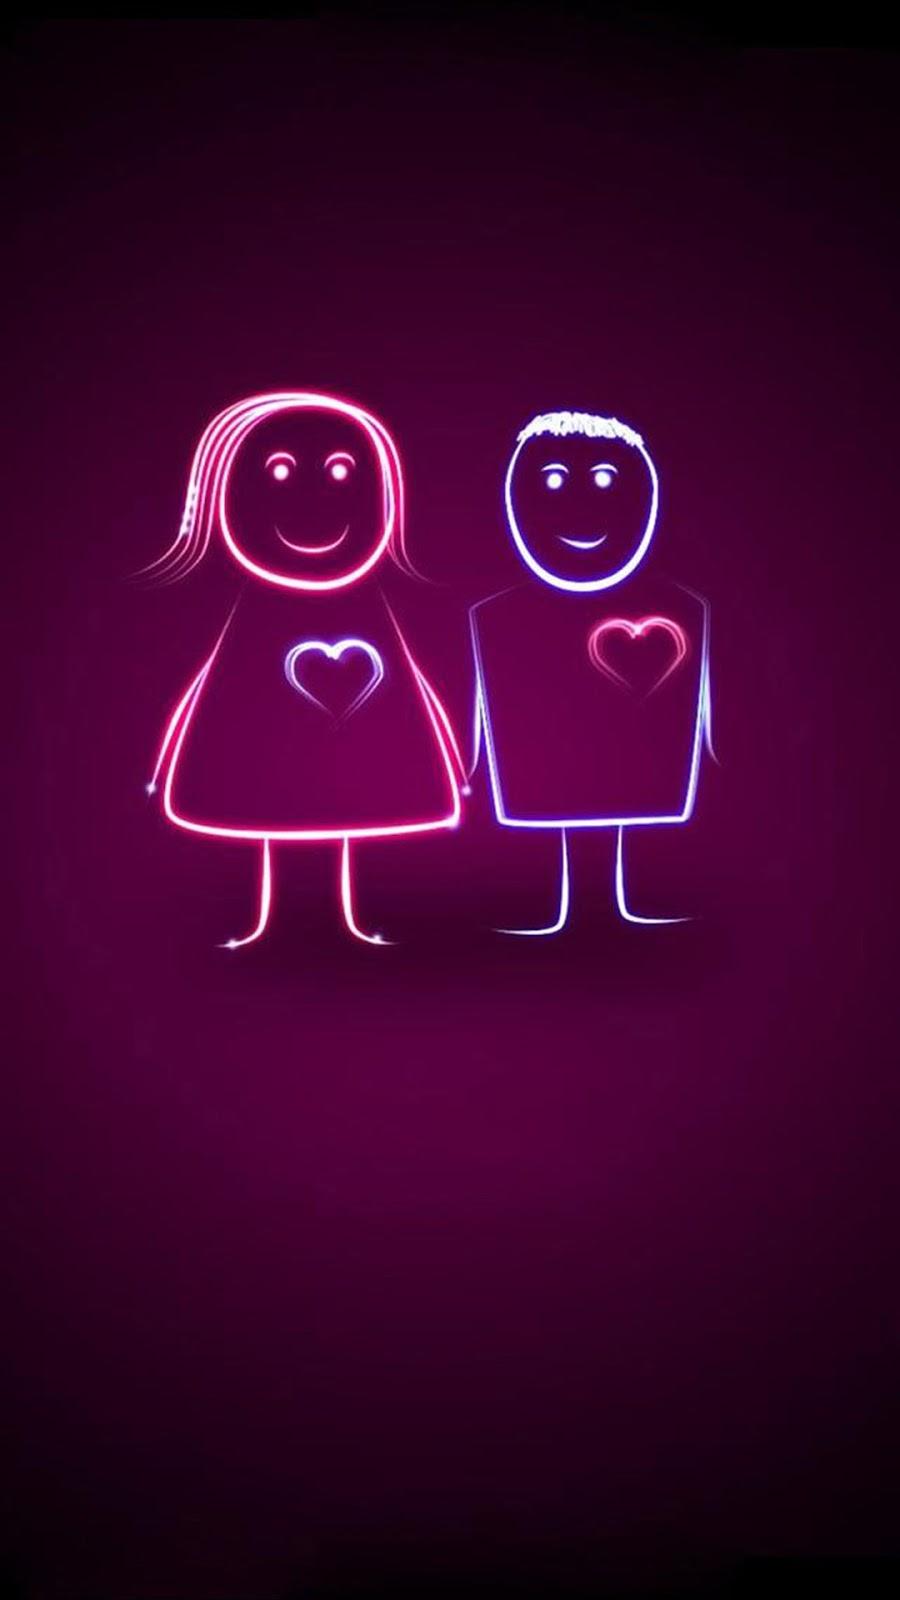 Love Couple Iphone 7 Iphone 7 Plus Wallpaper Hd Iphone 7